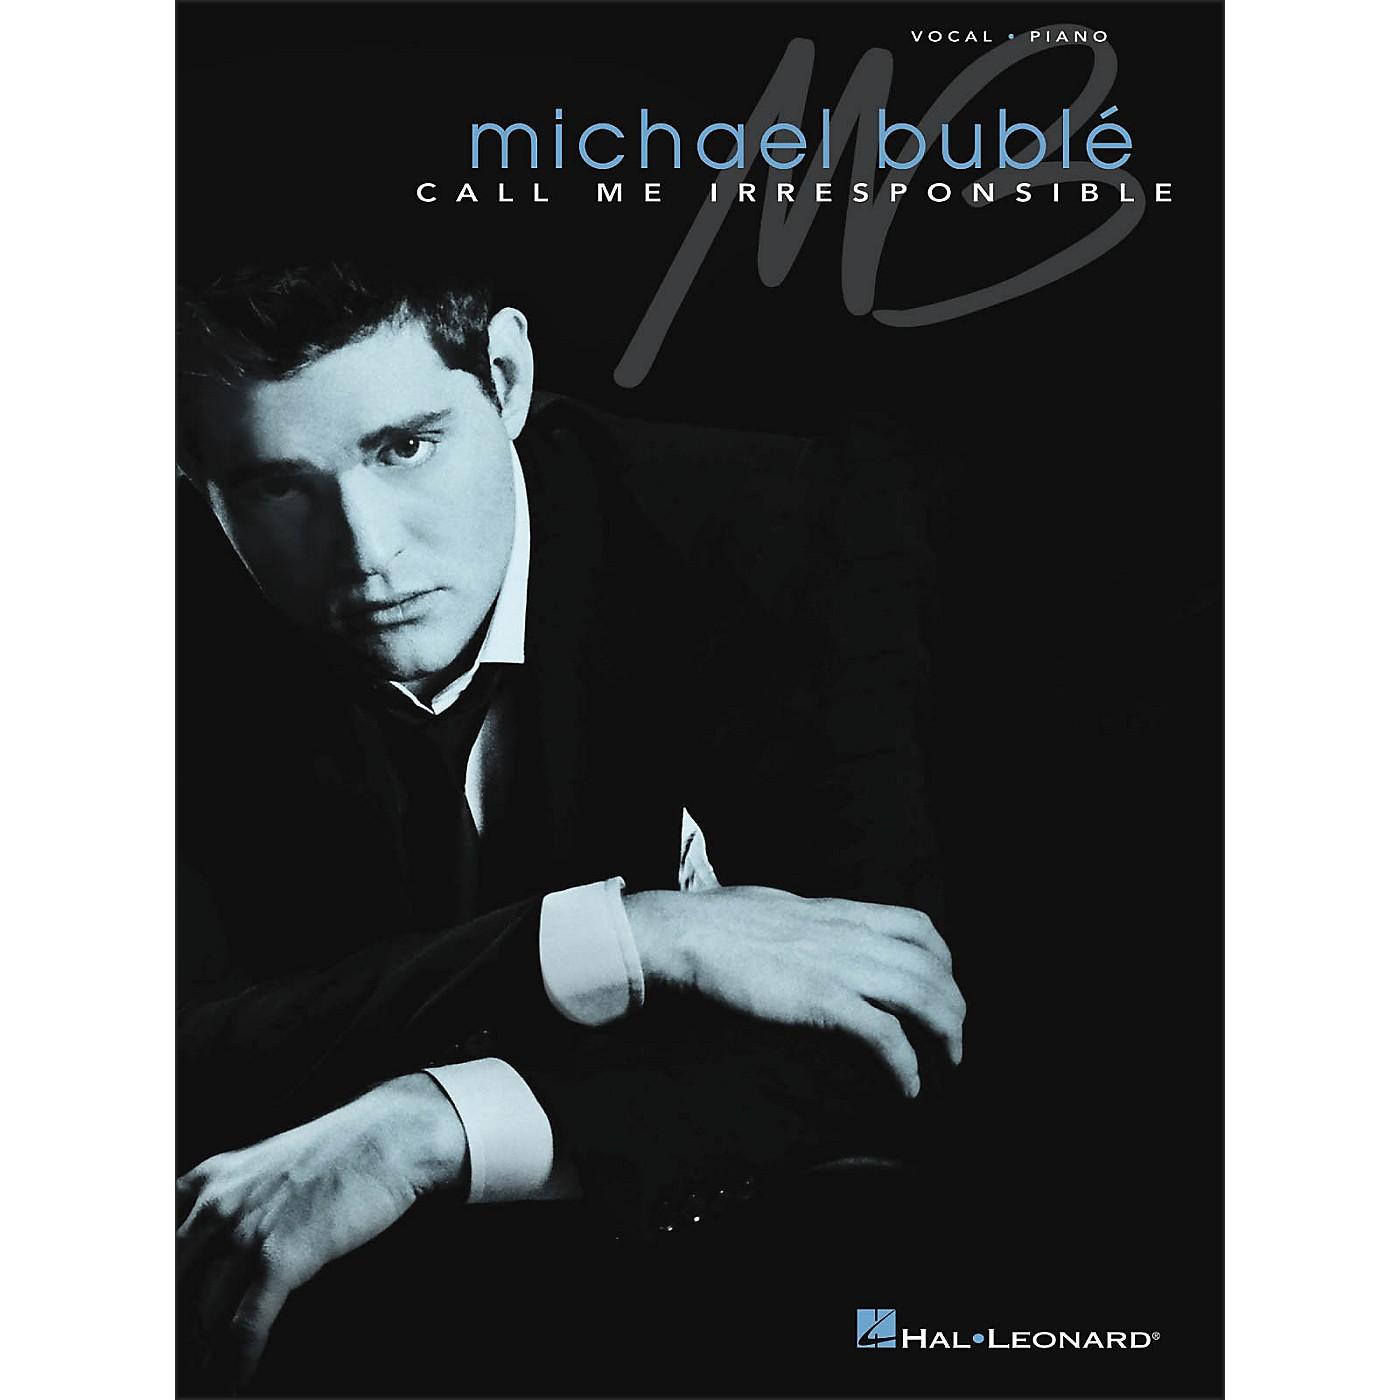 Hal Leonard Call Me Irresponsible - Michael Buble Vocal / Piano thumbnail